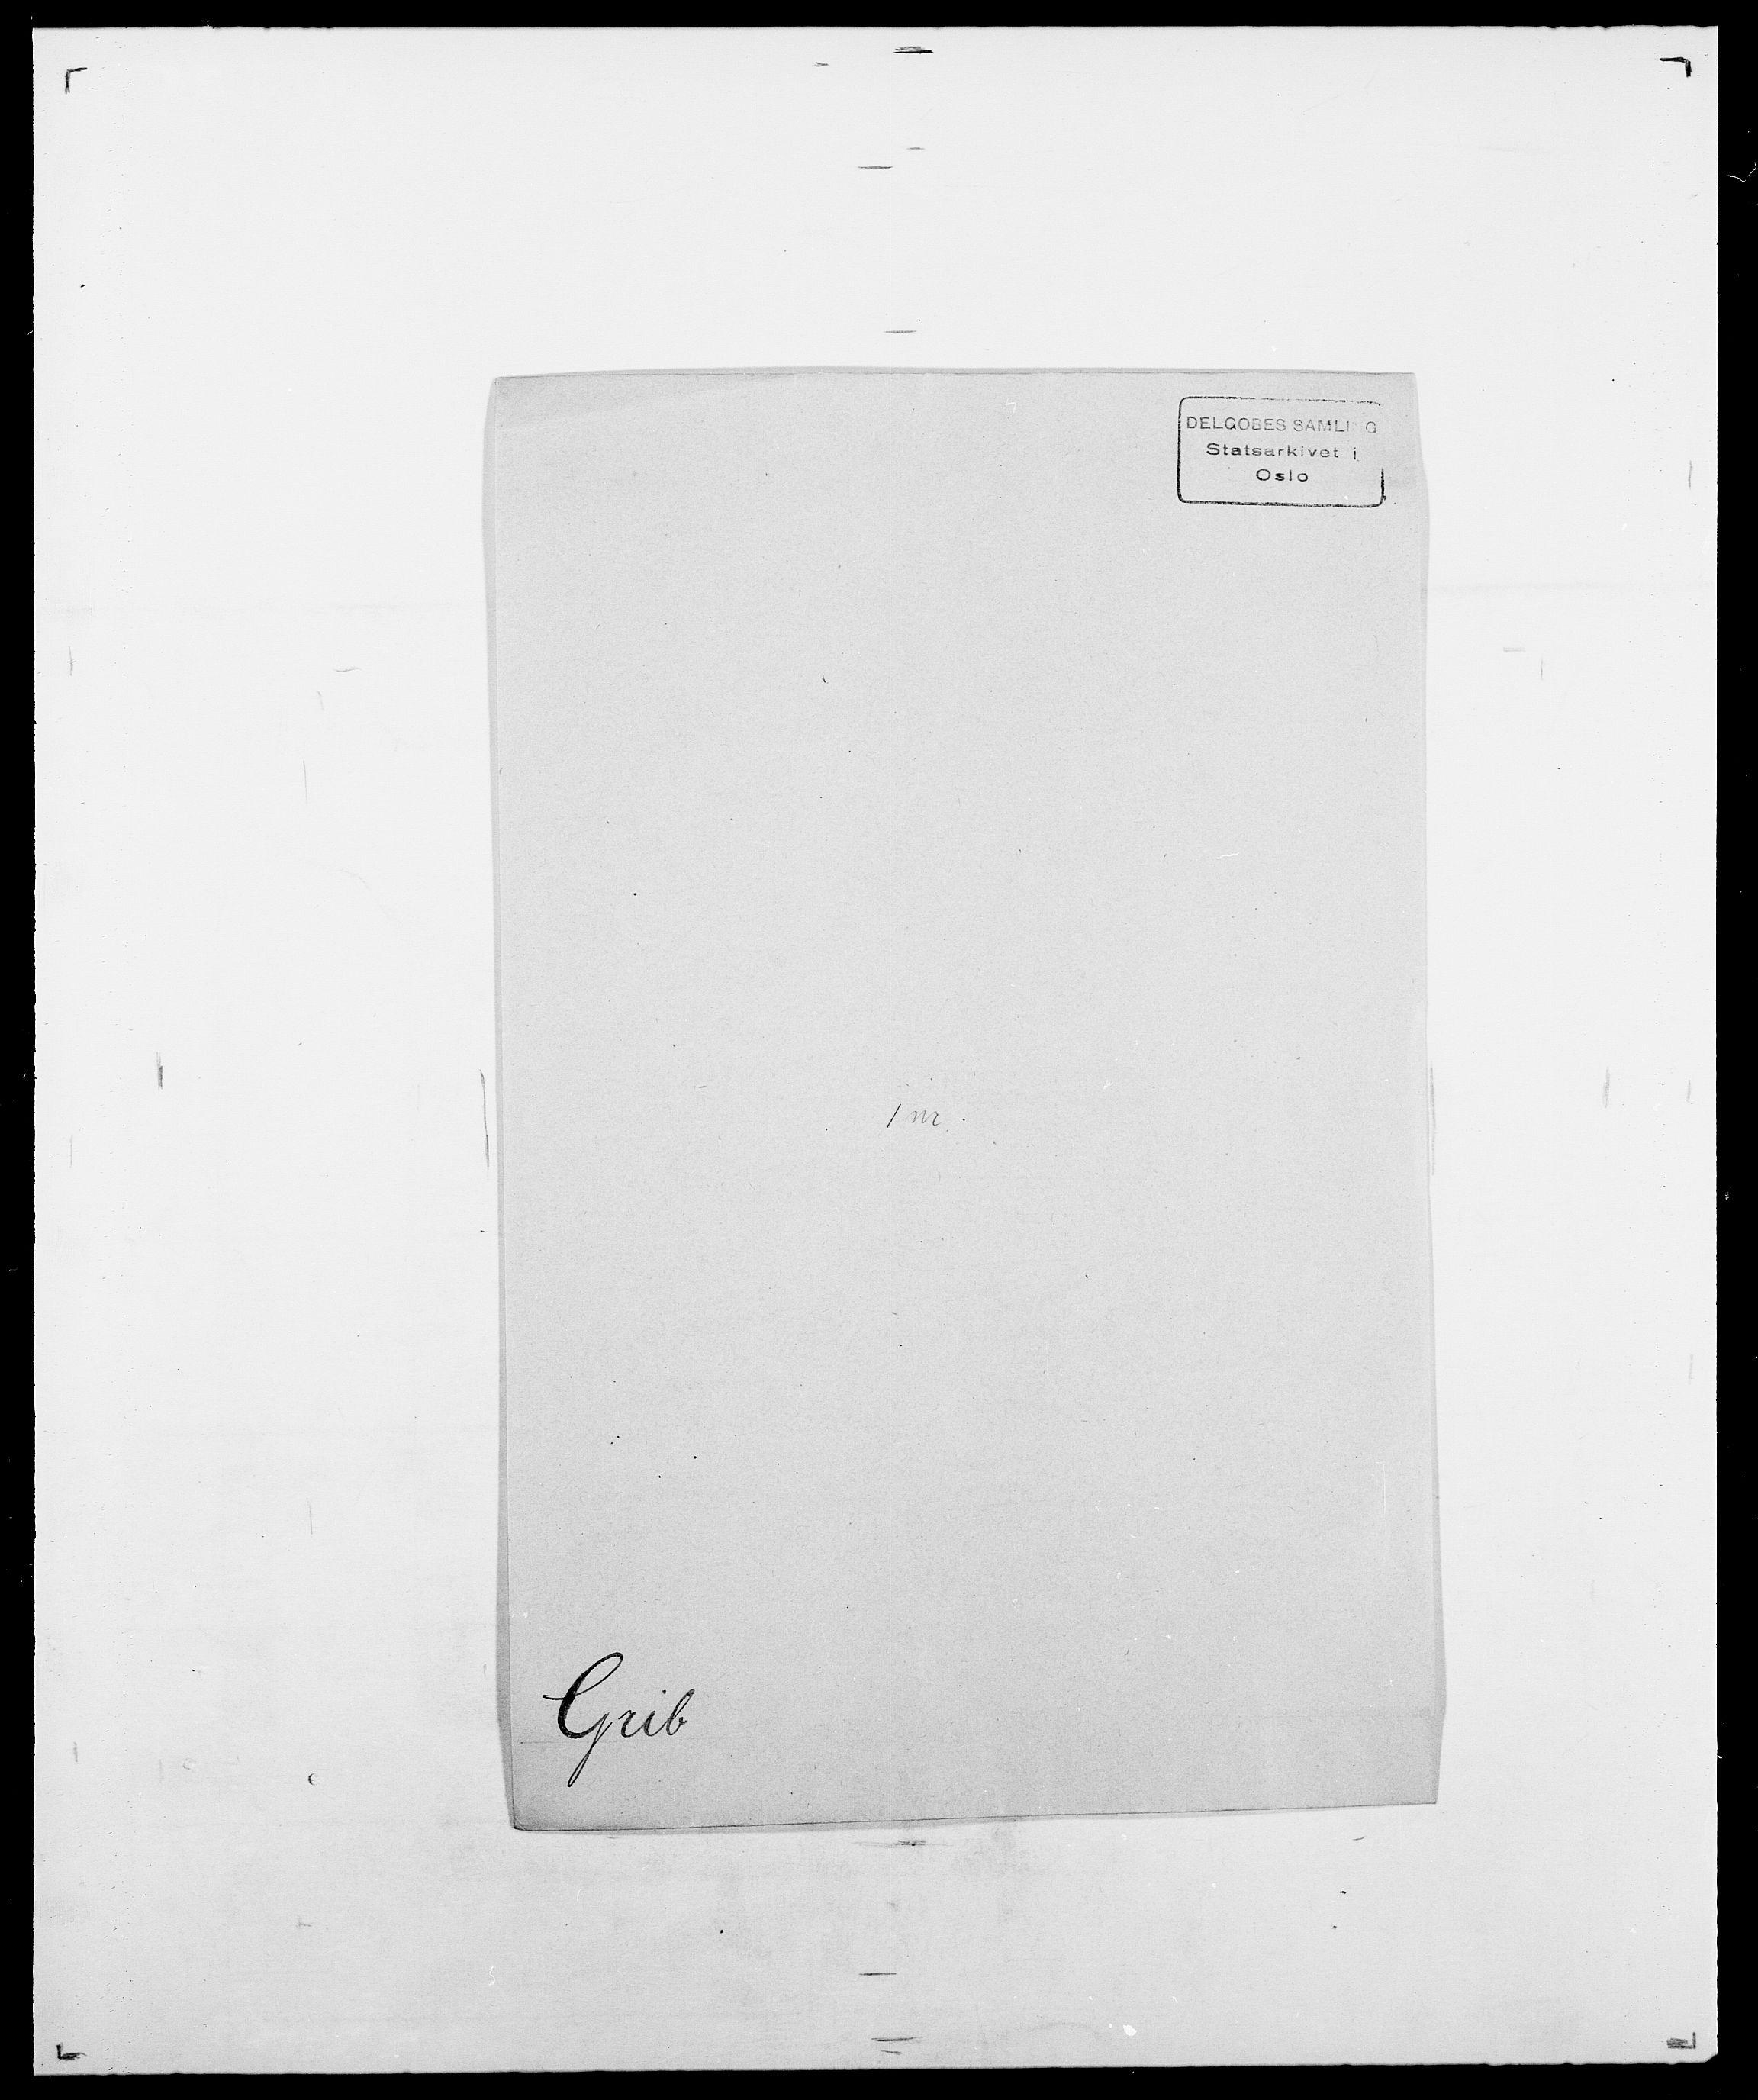 SAO, Delgobe, Charles Antoine - samling, D/Da/L0014: Giebdhausen - Grip, s. 641